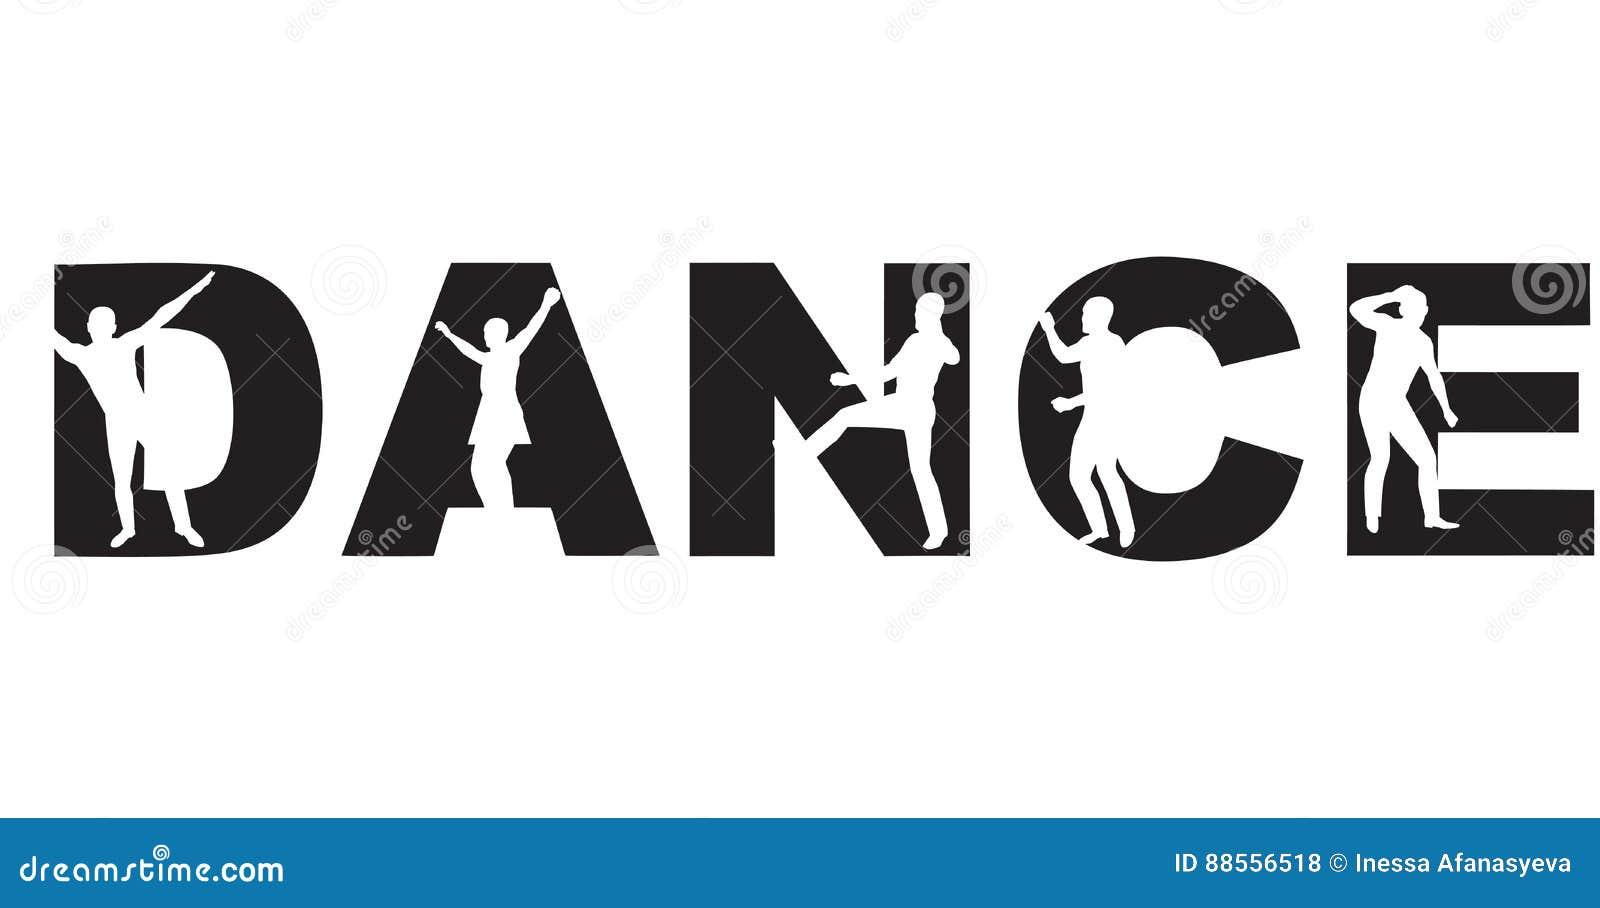 The Word Dance In Different Fonts | www.pixshark.com ...